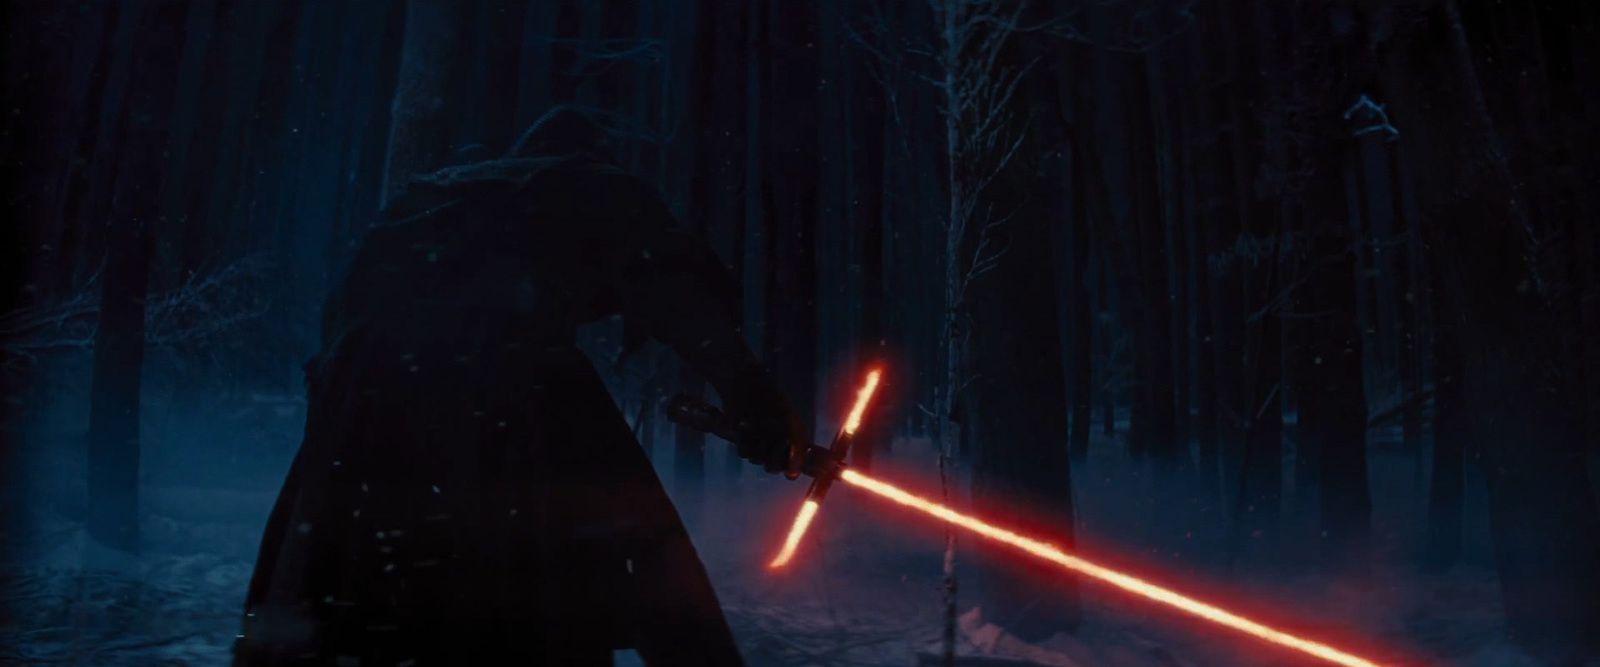 Top 7 des parodies du sabre laser de Star Wars 7 en gif